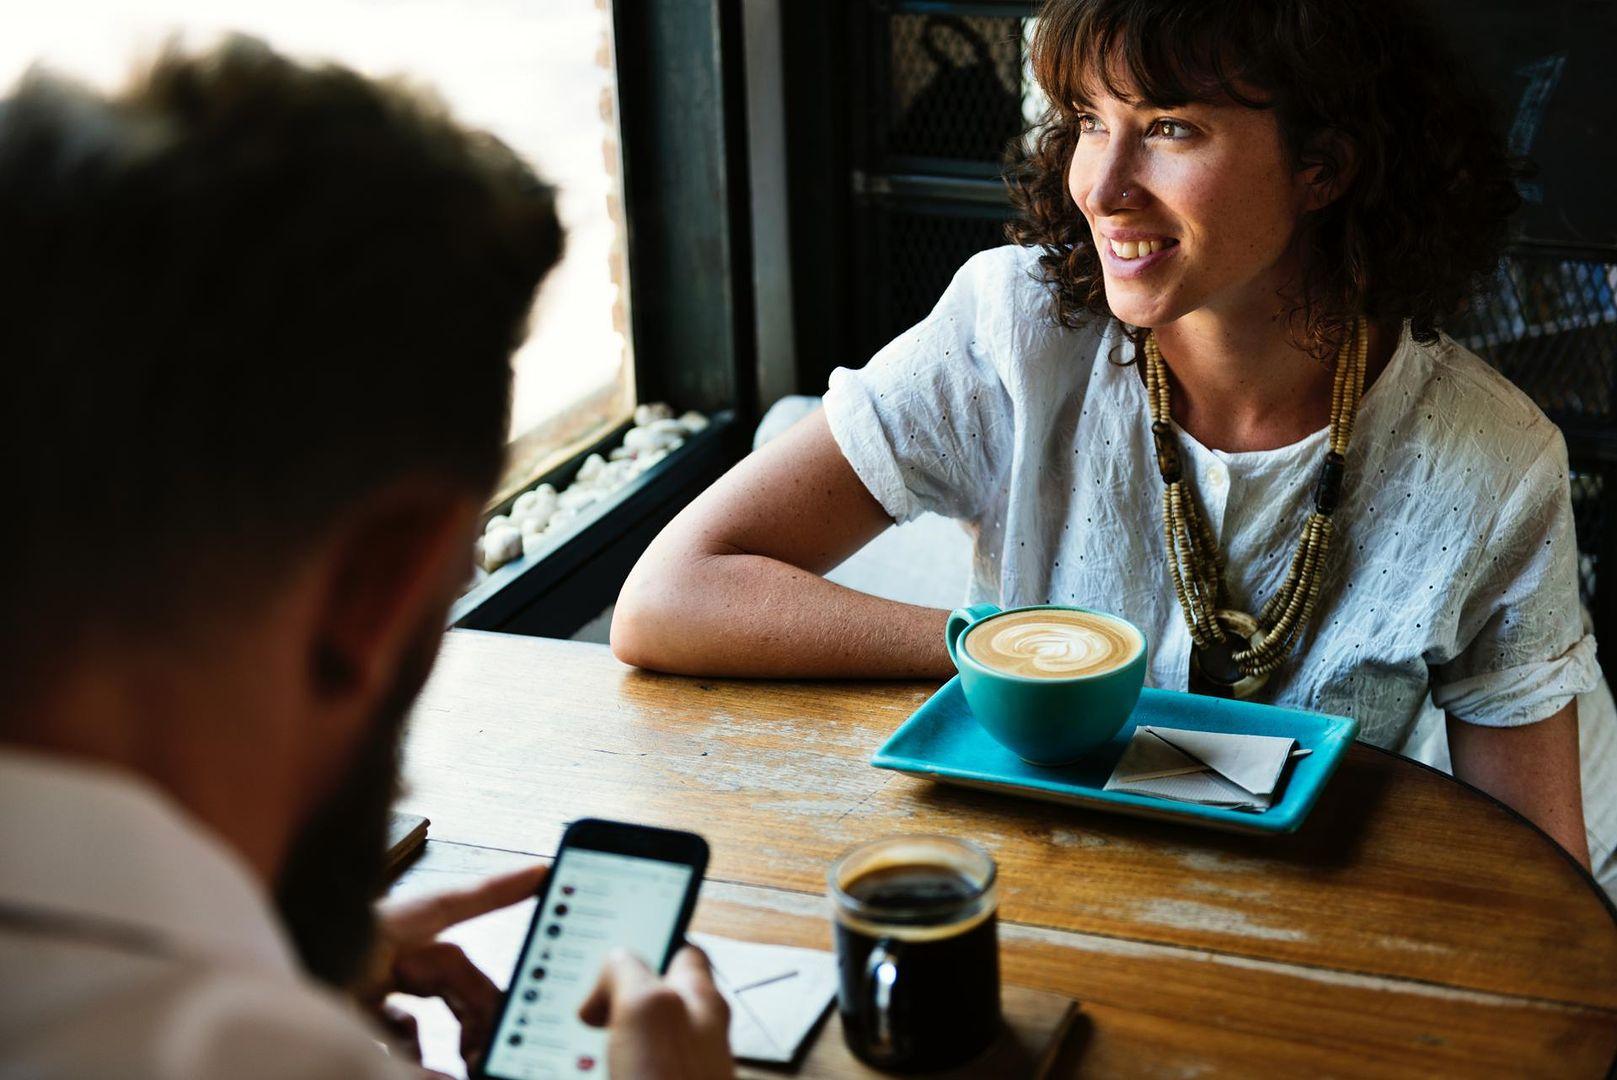 5 na żywo bada randki online